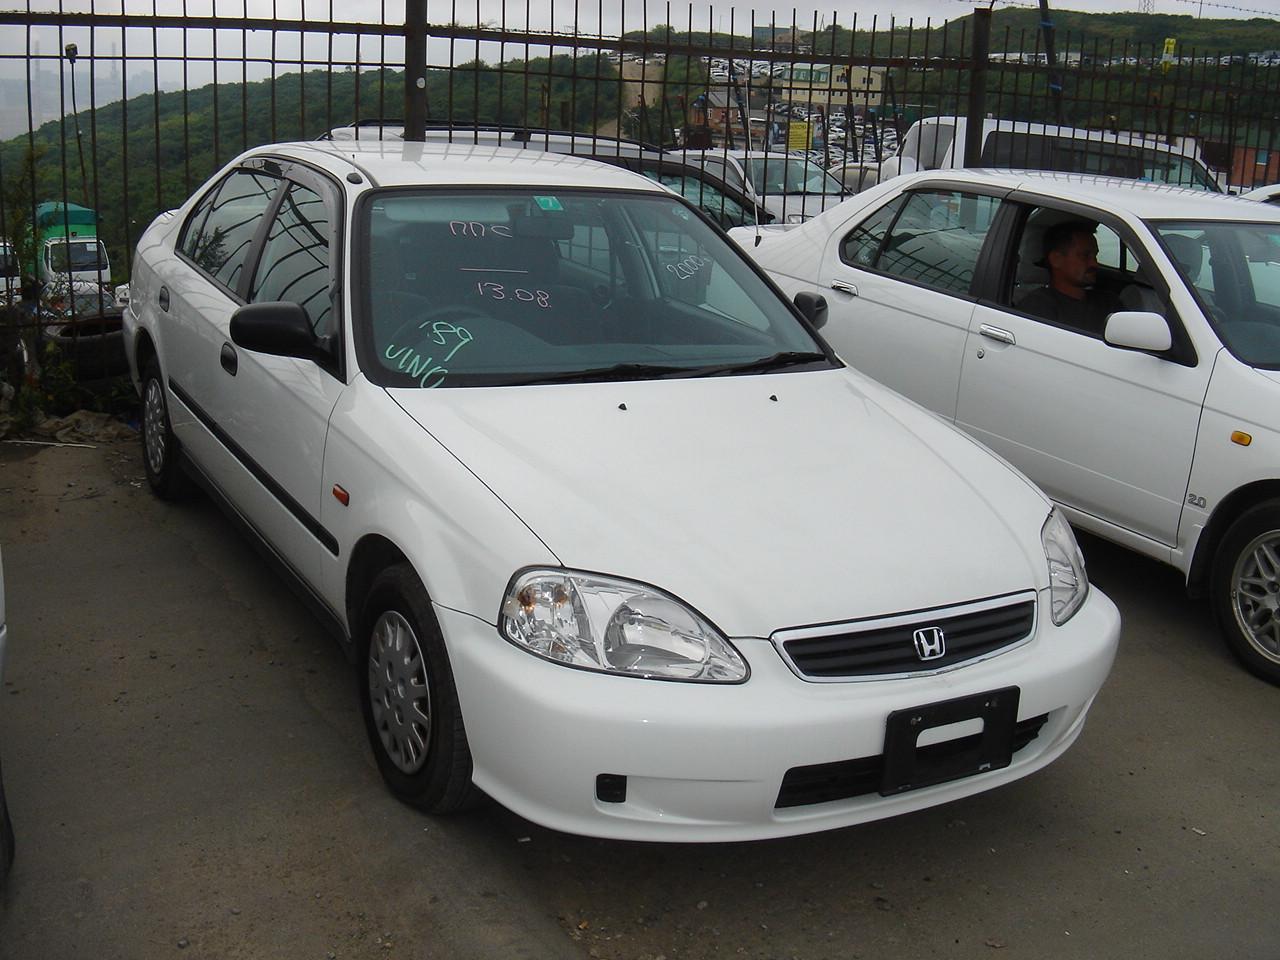 honda 2000 civic hybrid ff 2003 cars automatic fuel specs 1280px 317kb 960px directory transmission